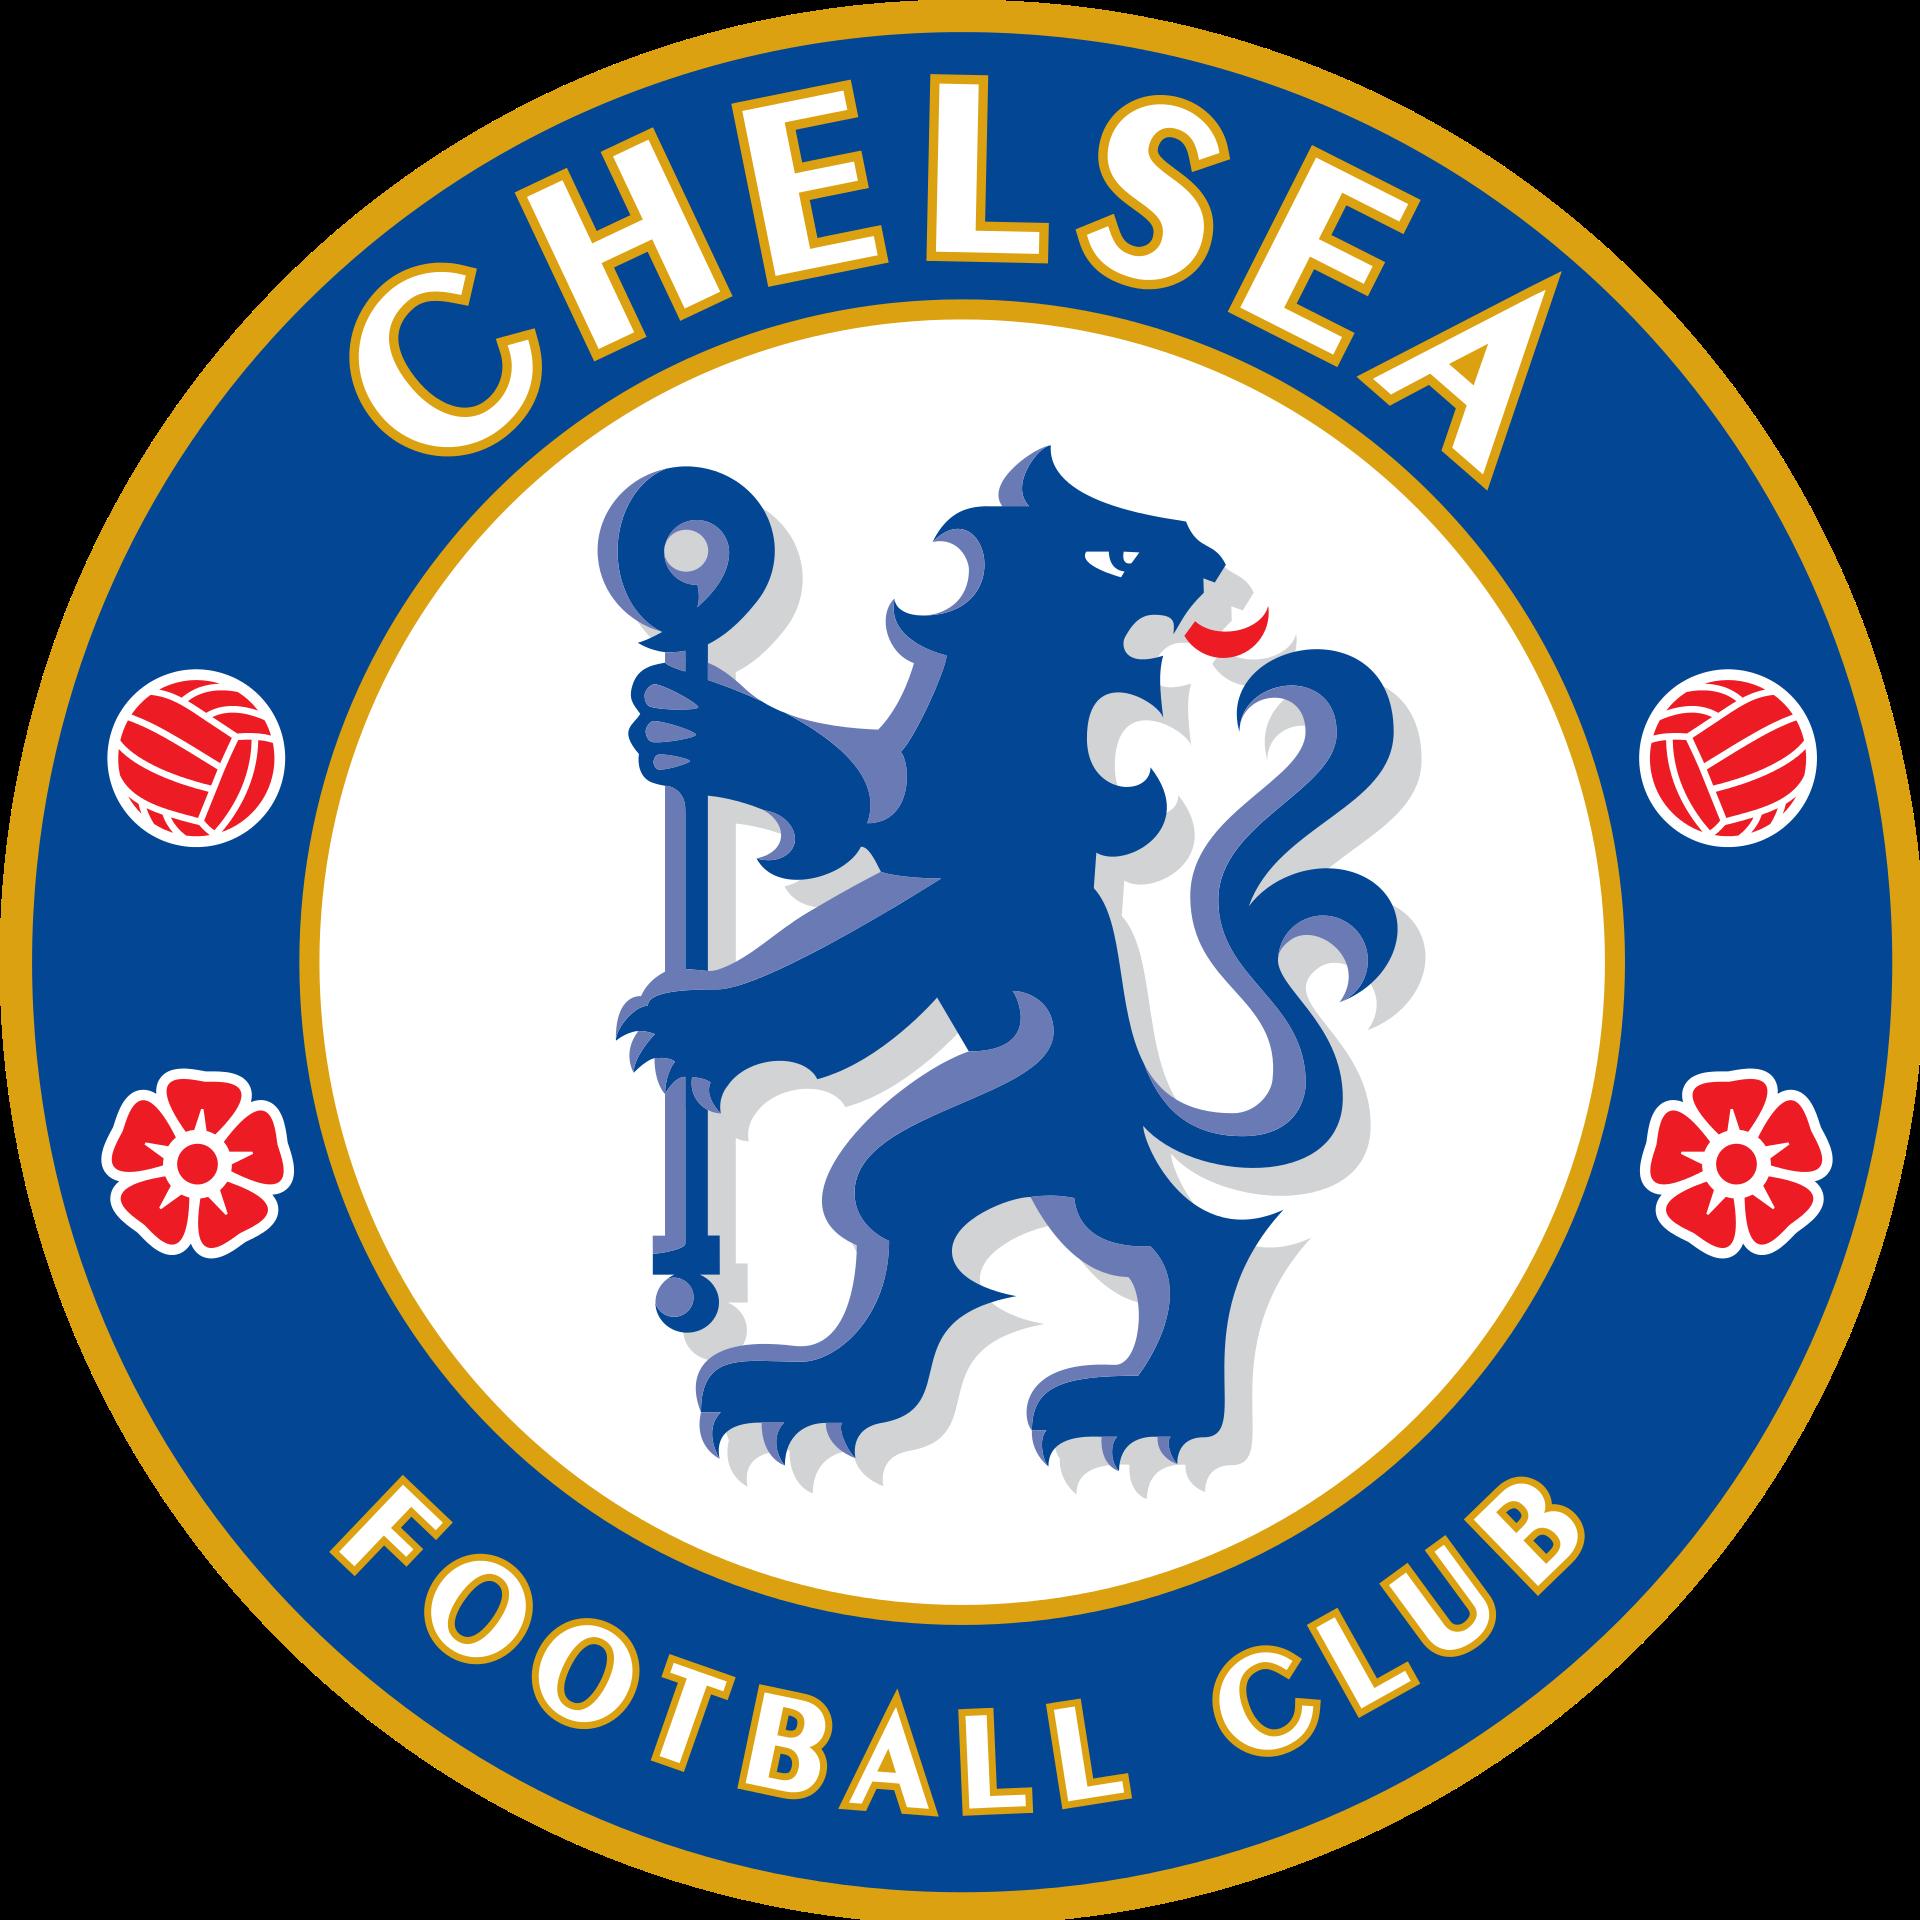 Chelsea_FC.png